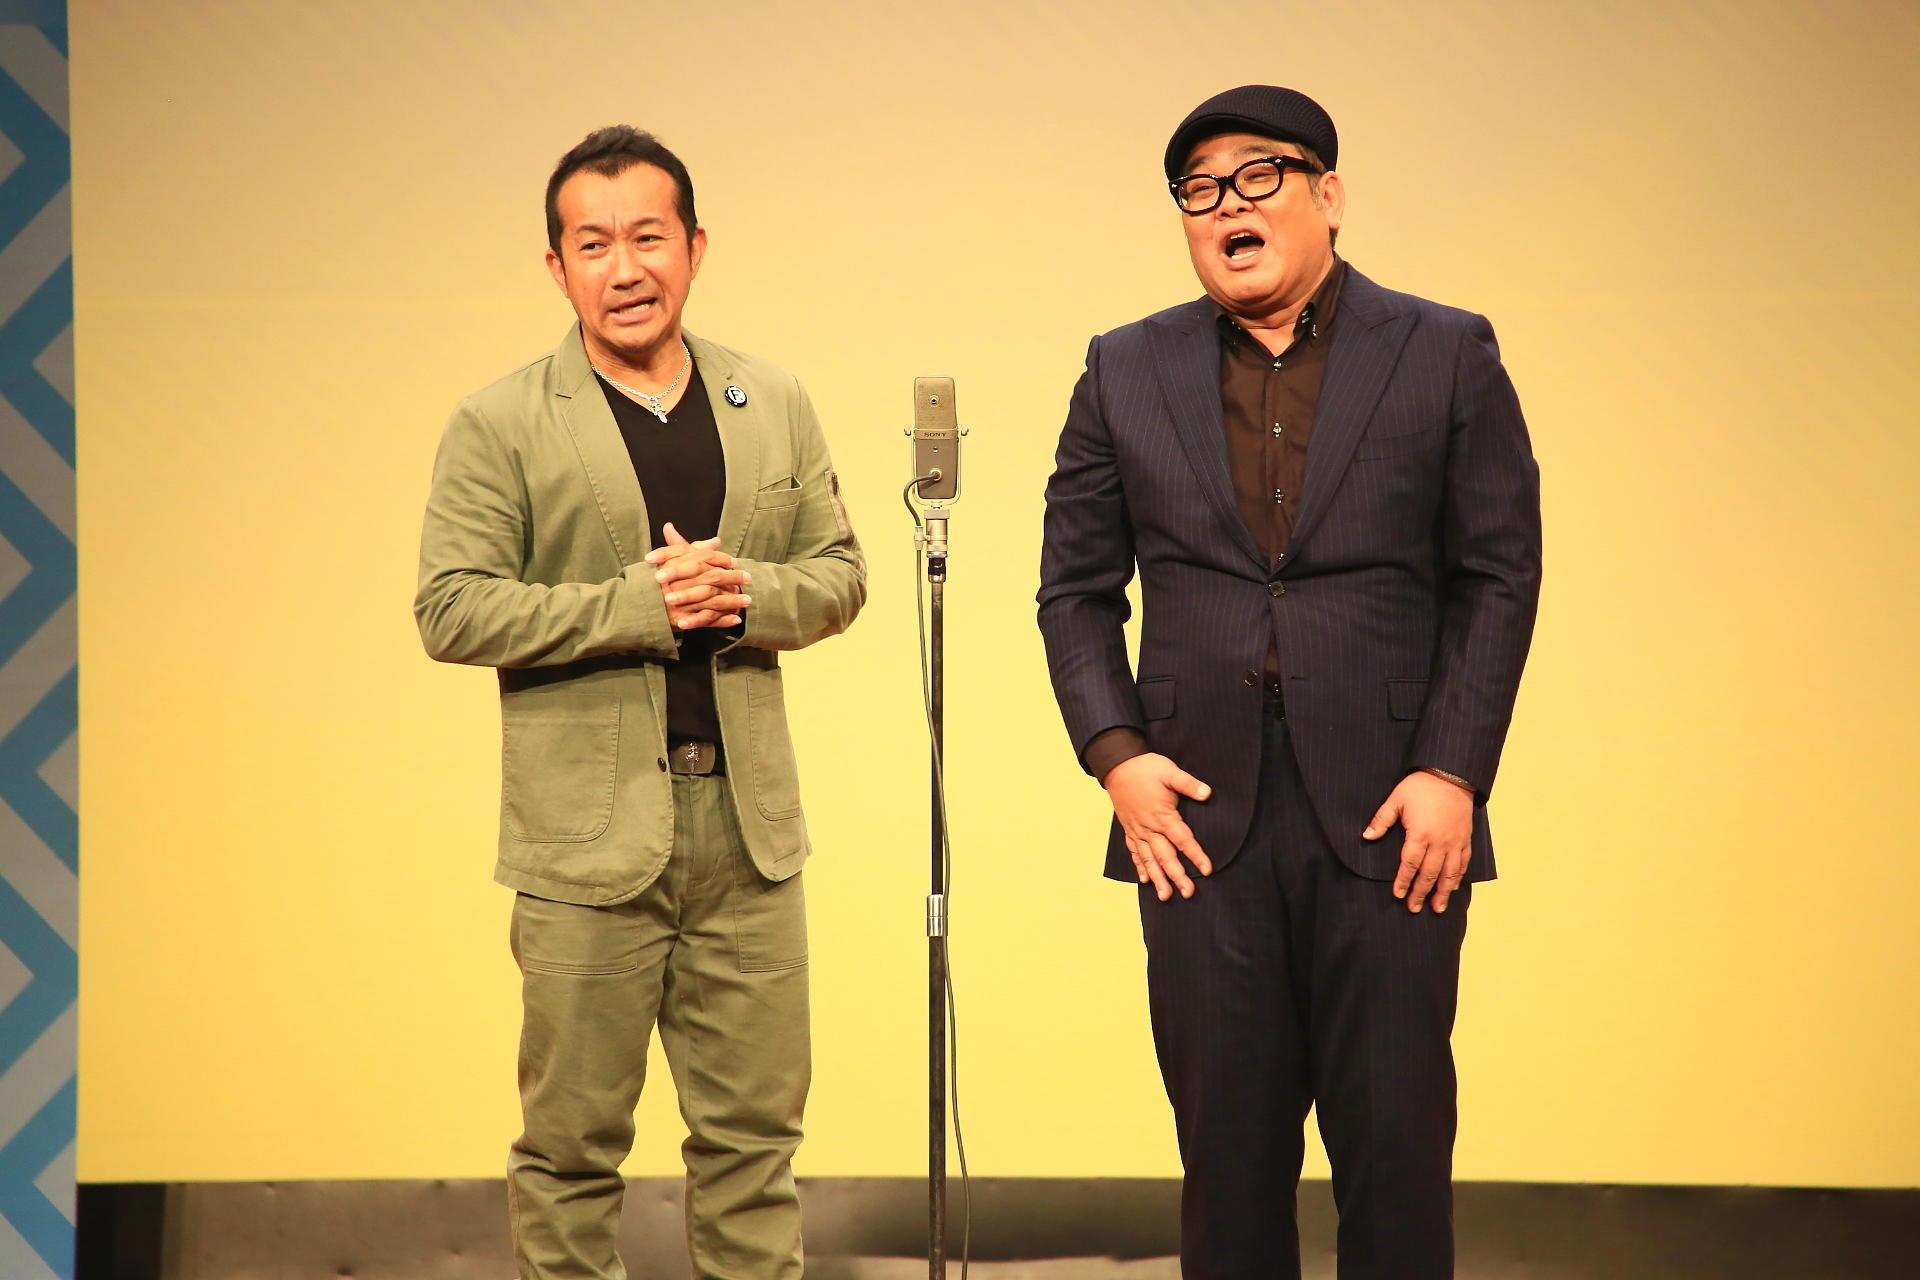 http://news.yoshimoto.co.jp/20171112095706-2a19ec26844309adacc953aa254957a3faeade10.jpg